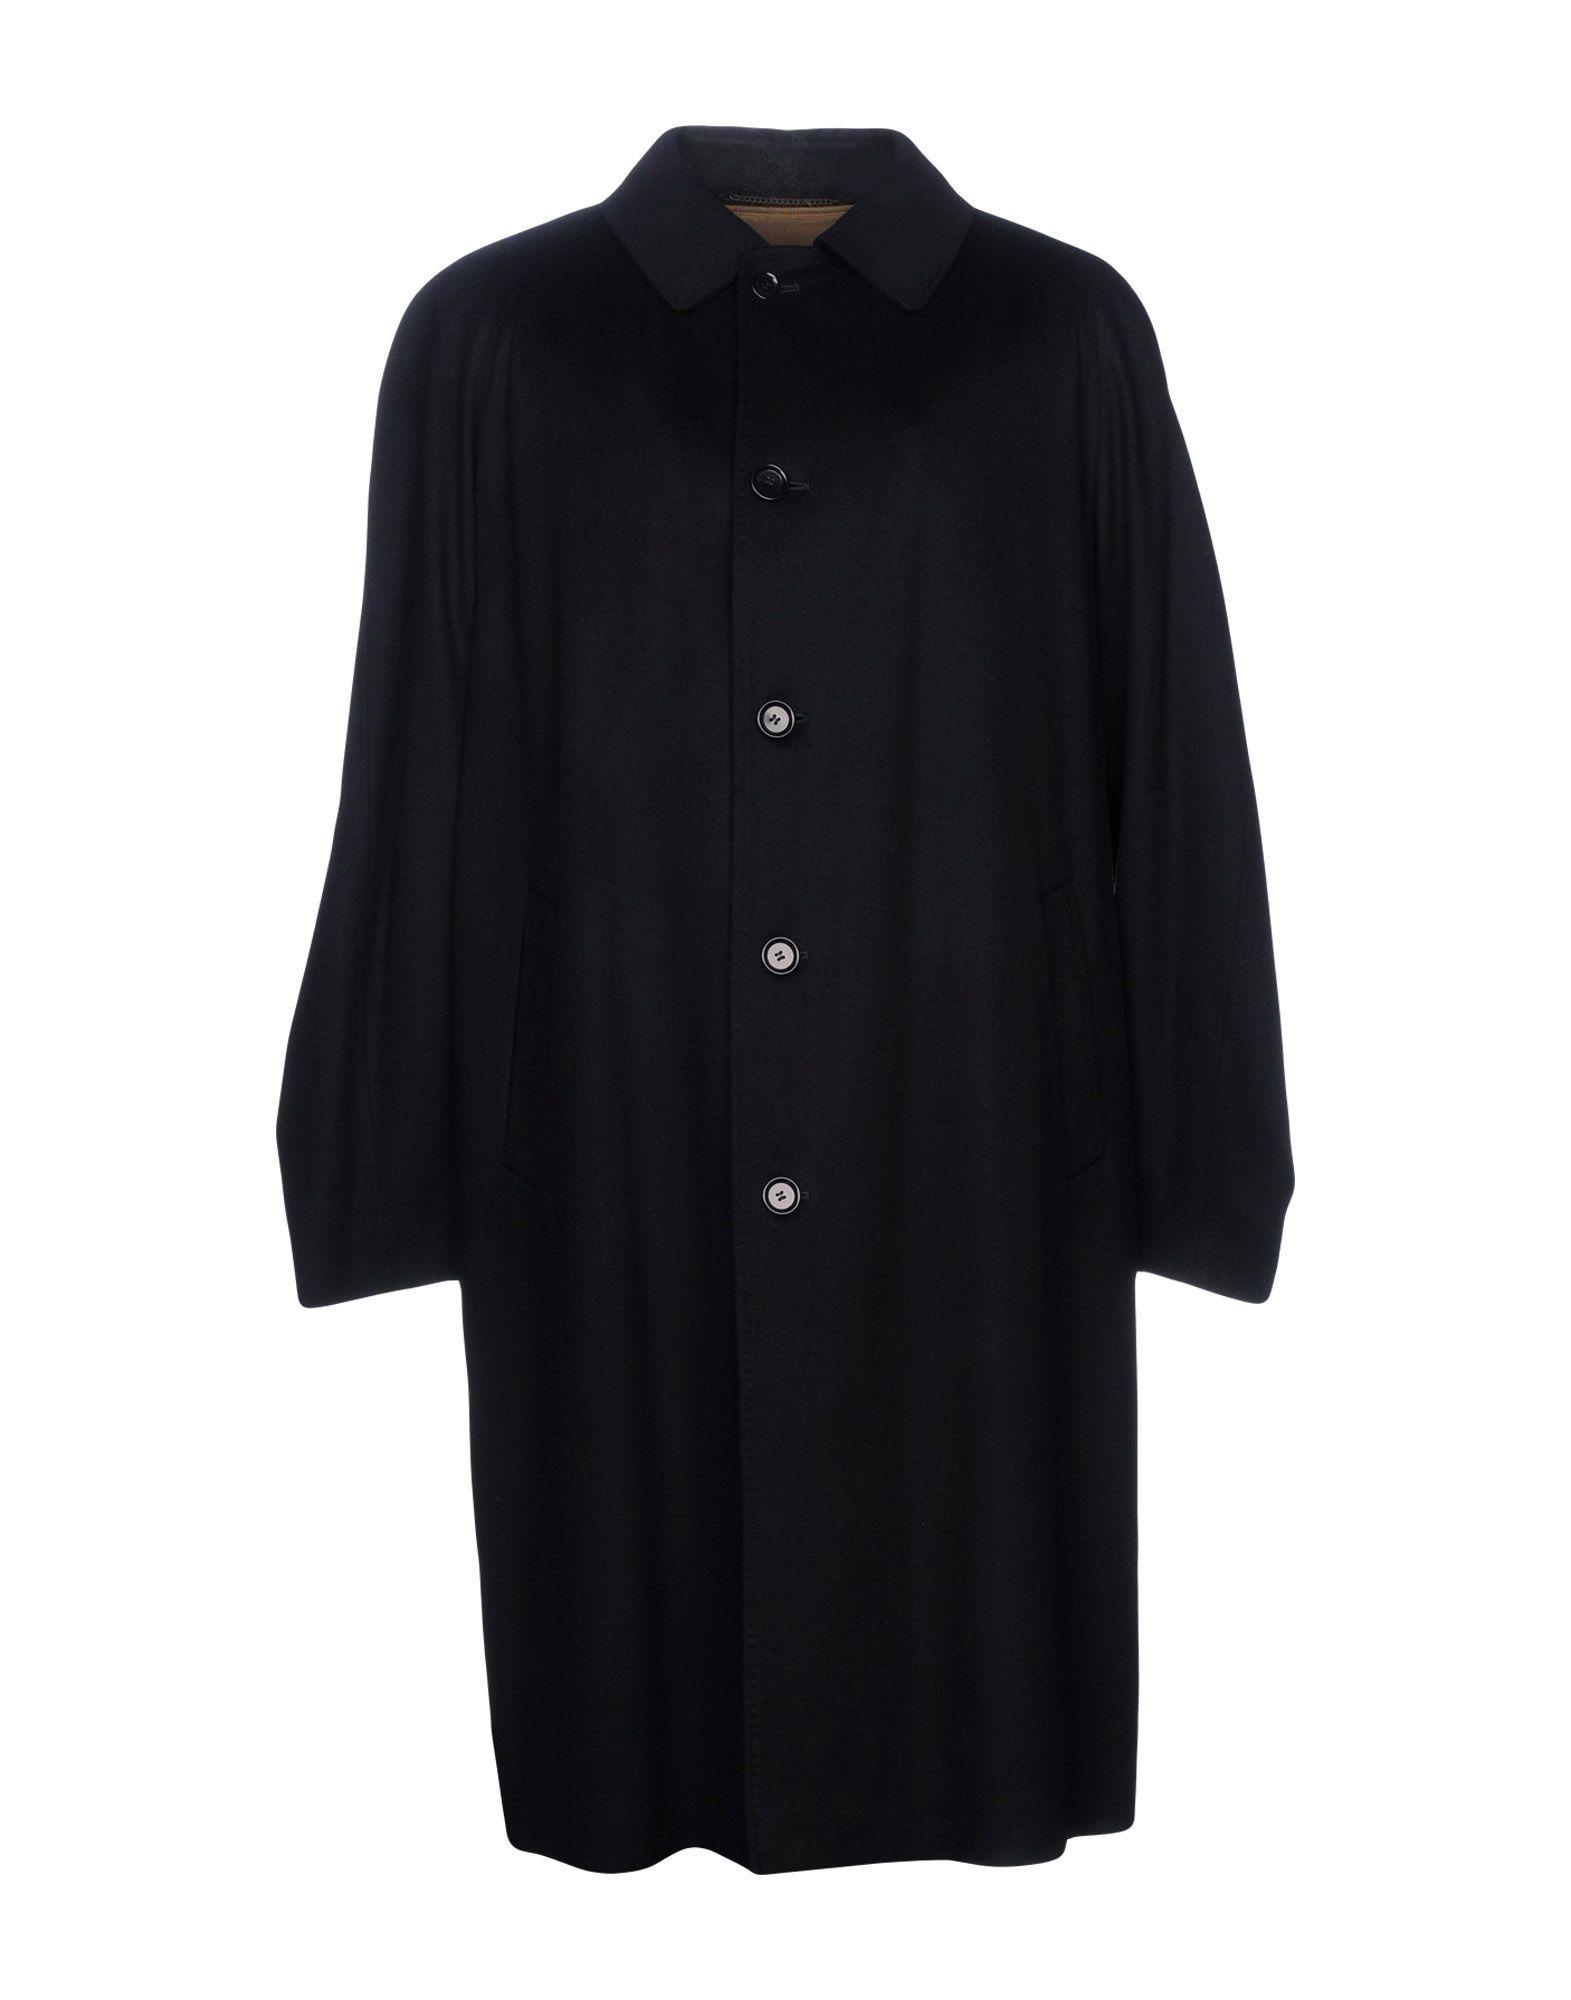 Schneiders Coats In Dark Blue